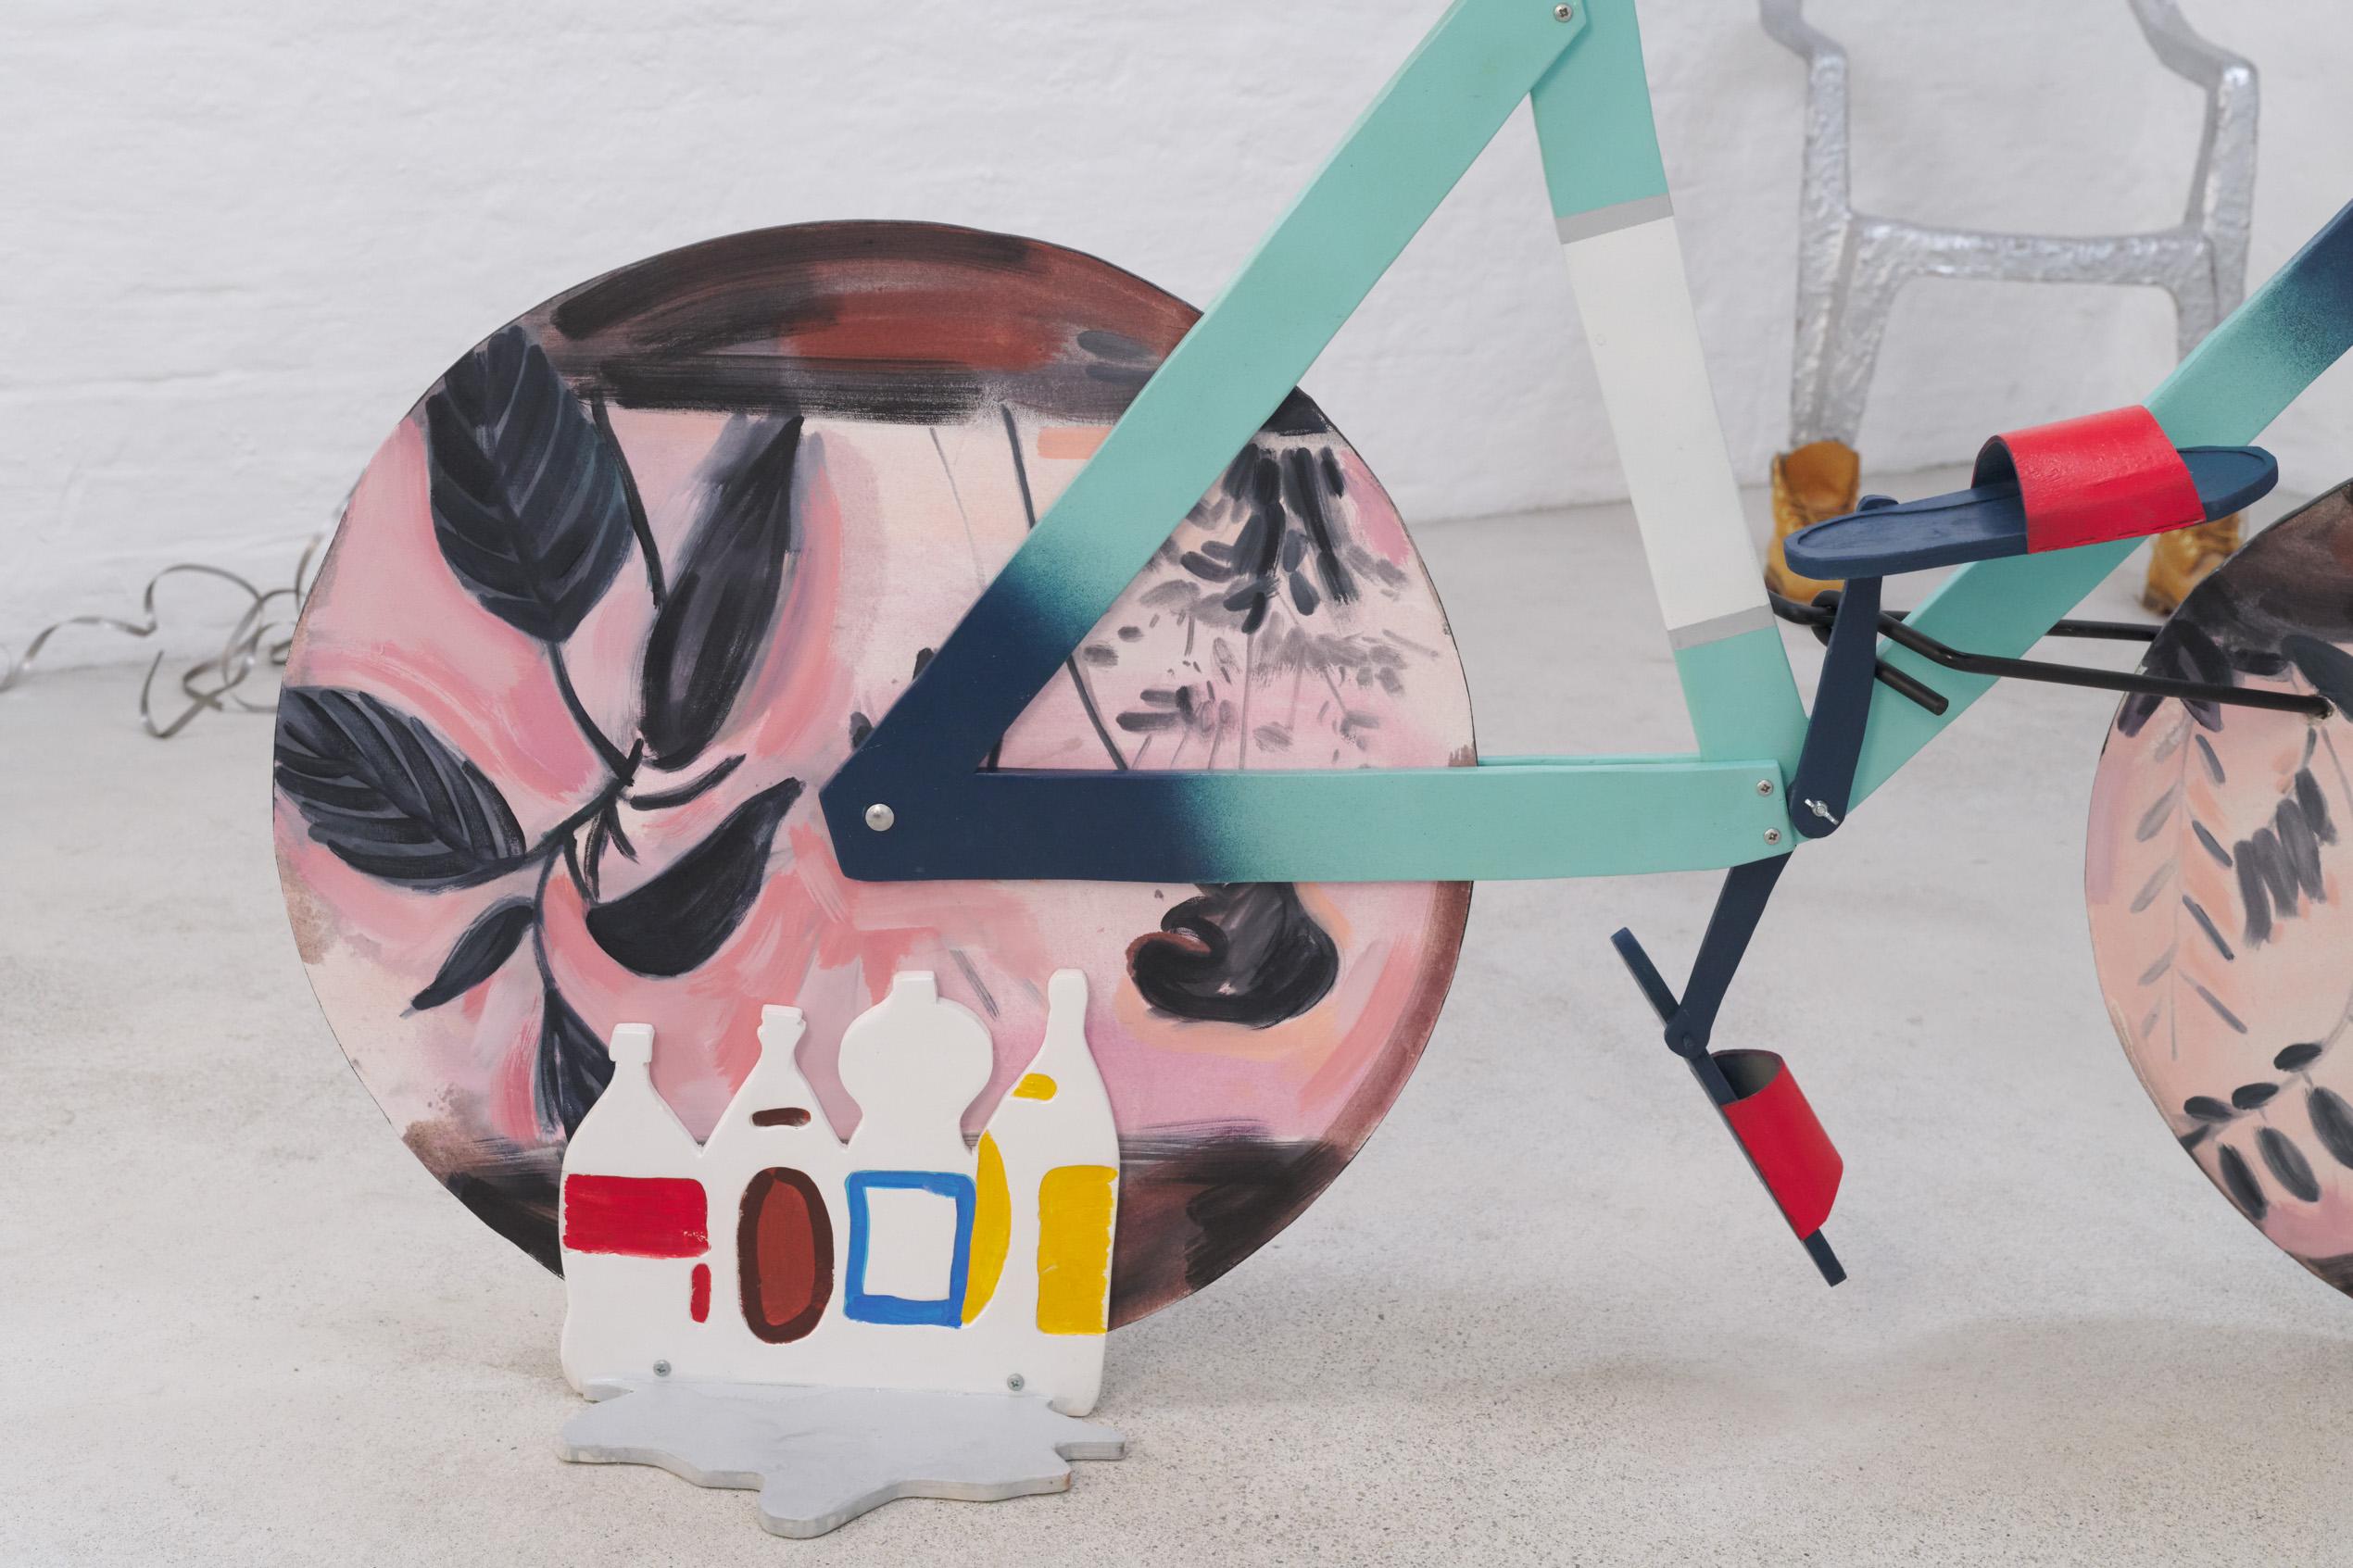 Ellinor Aurora Aasgaard and Elizabeth Ravn, Celeste, 2019, 173 x 60 x 100 cm, wood, oil paint, plastic, canvas, bicycle bell